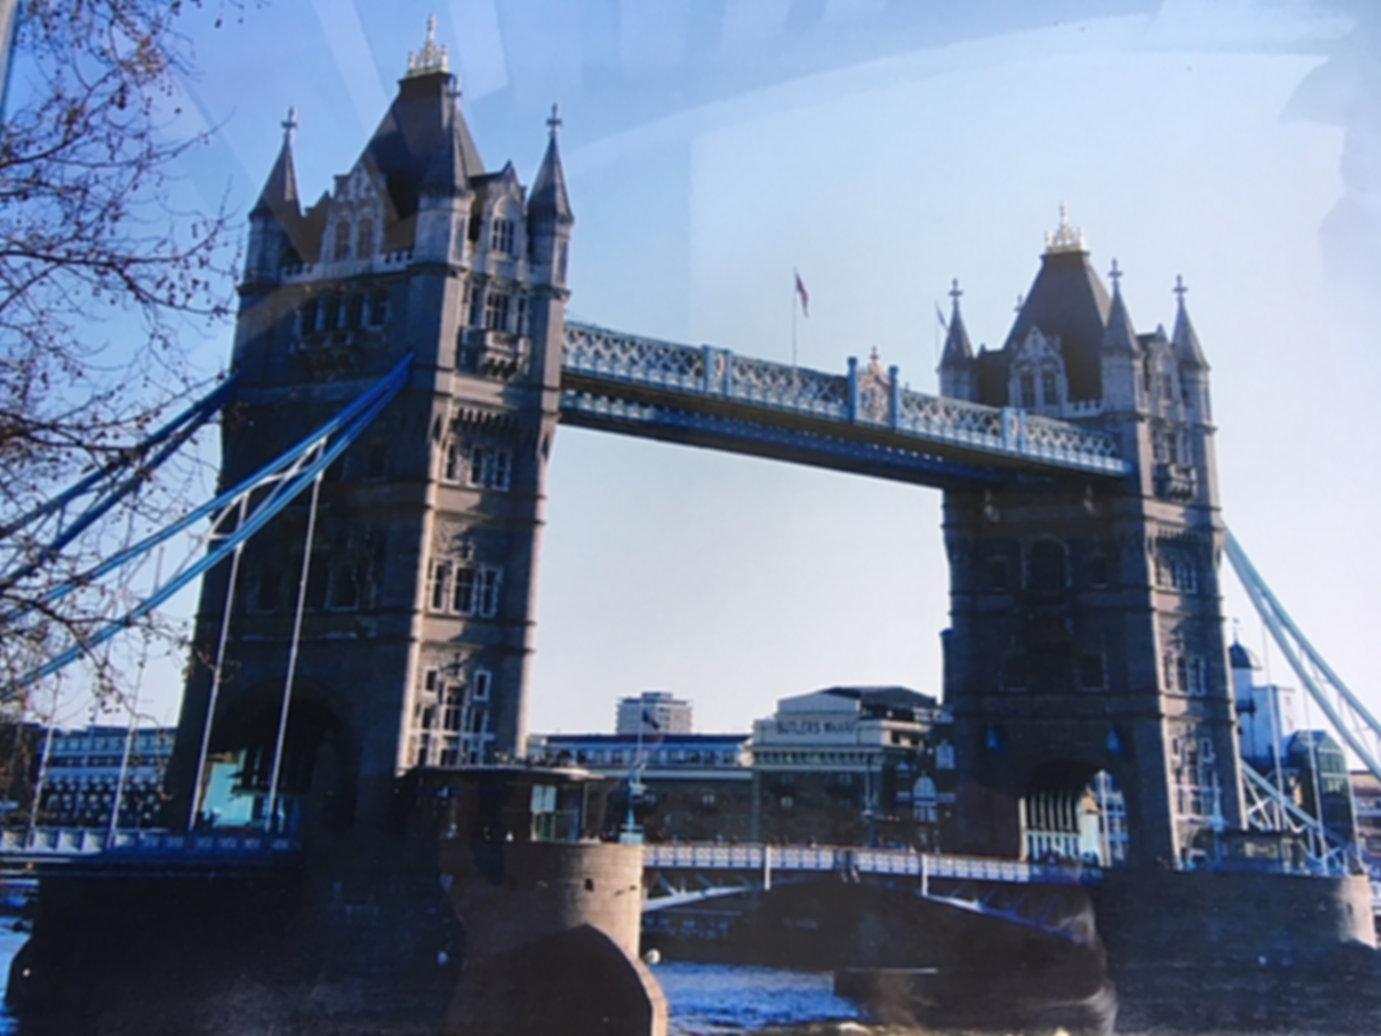 London Bridge, All Legal & More Limited